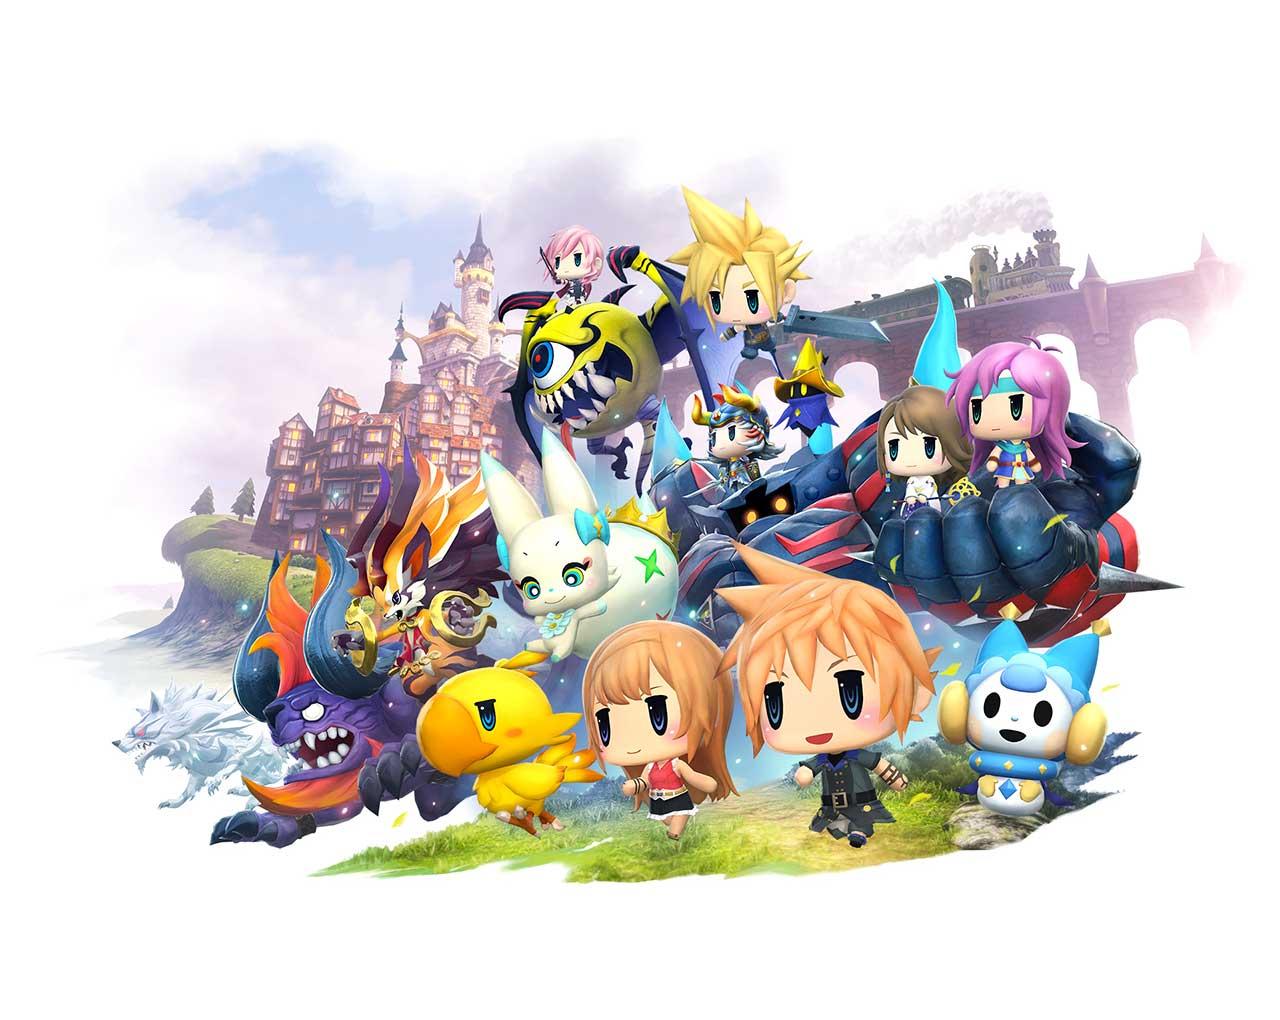 World Of Final Fantasy Wallpaper 1 - World Of Final Fantasy Maxima , HD Wallpaper & Backgrounds